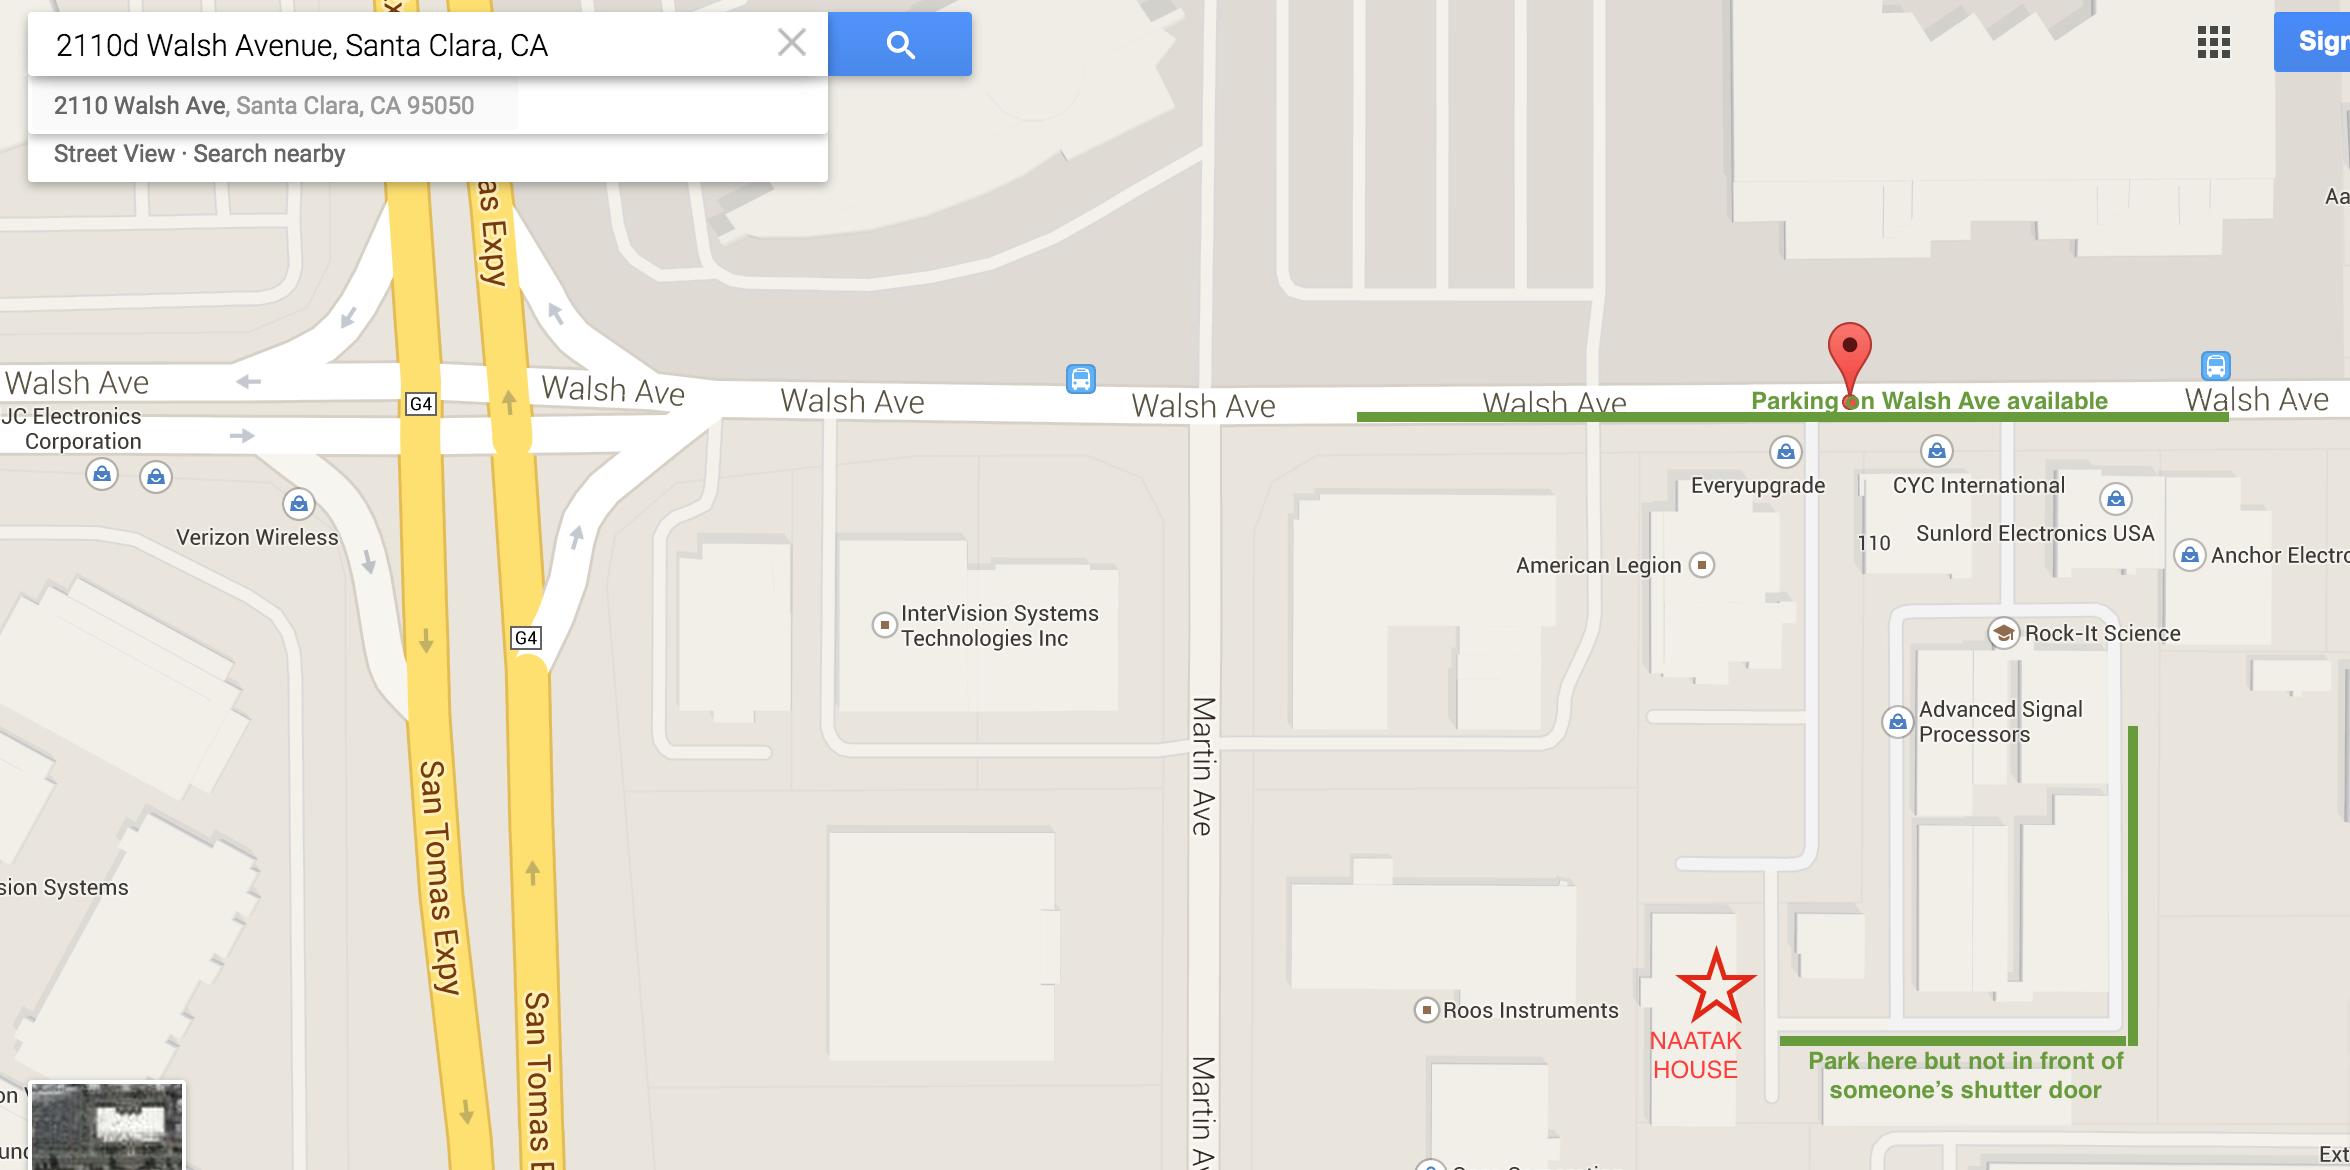 Naatak House Parking Map